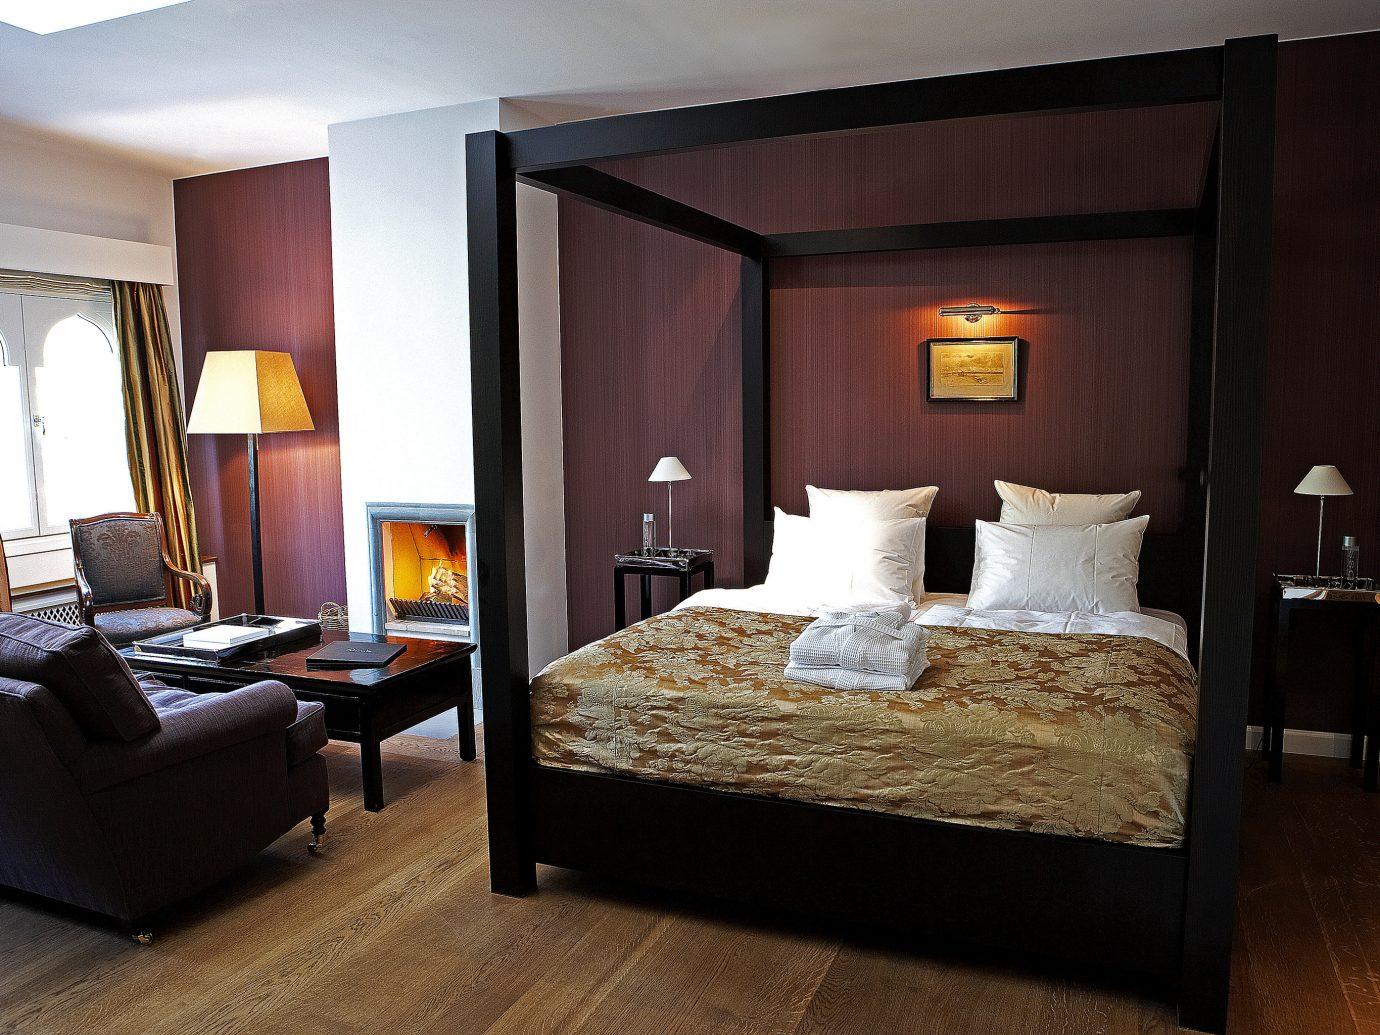 Boutique Hotels Copenhagen Denmark Hotels indoor floor wall room bed hotel Suite Bedroom ceiling interior design bed frame furniture interior designer